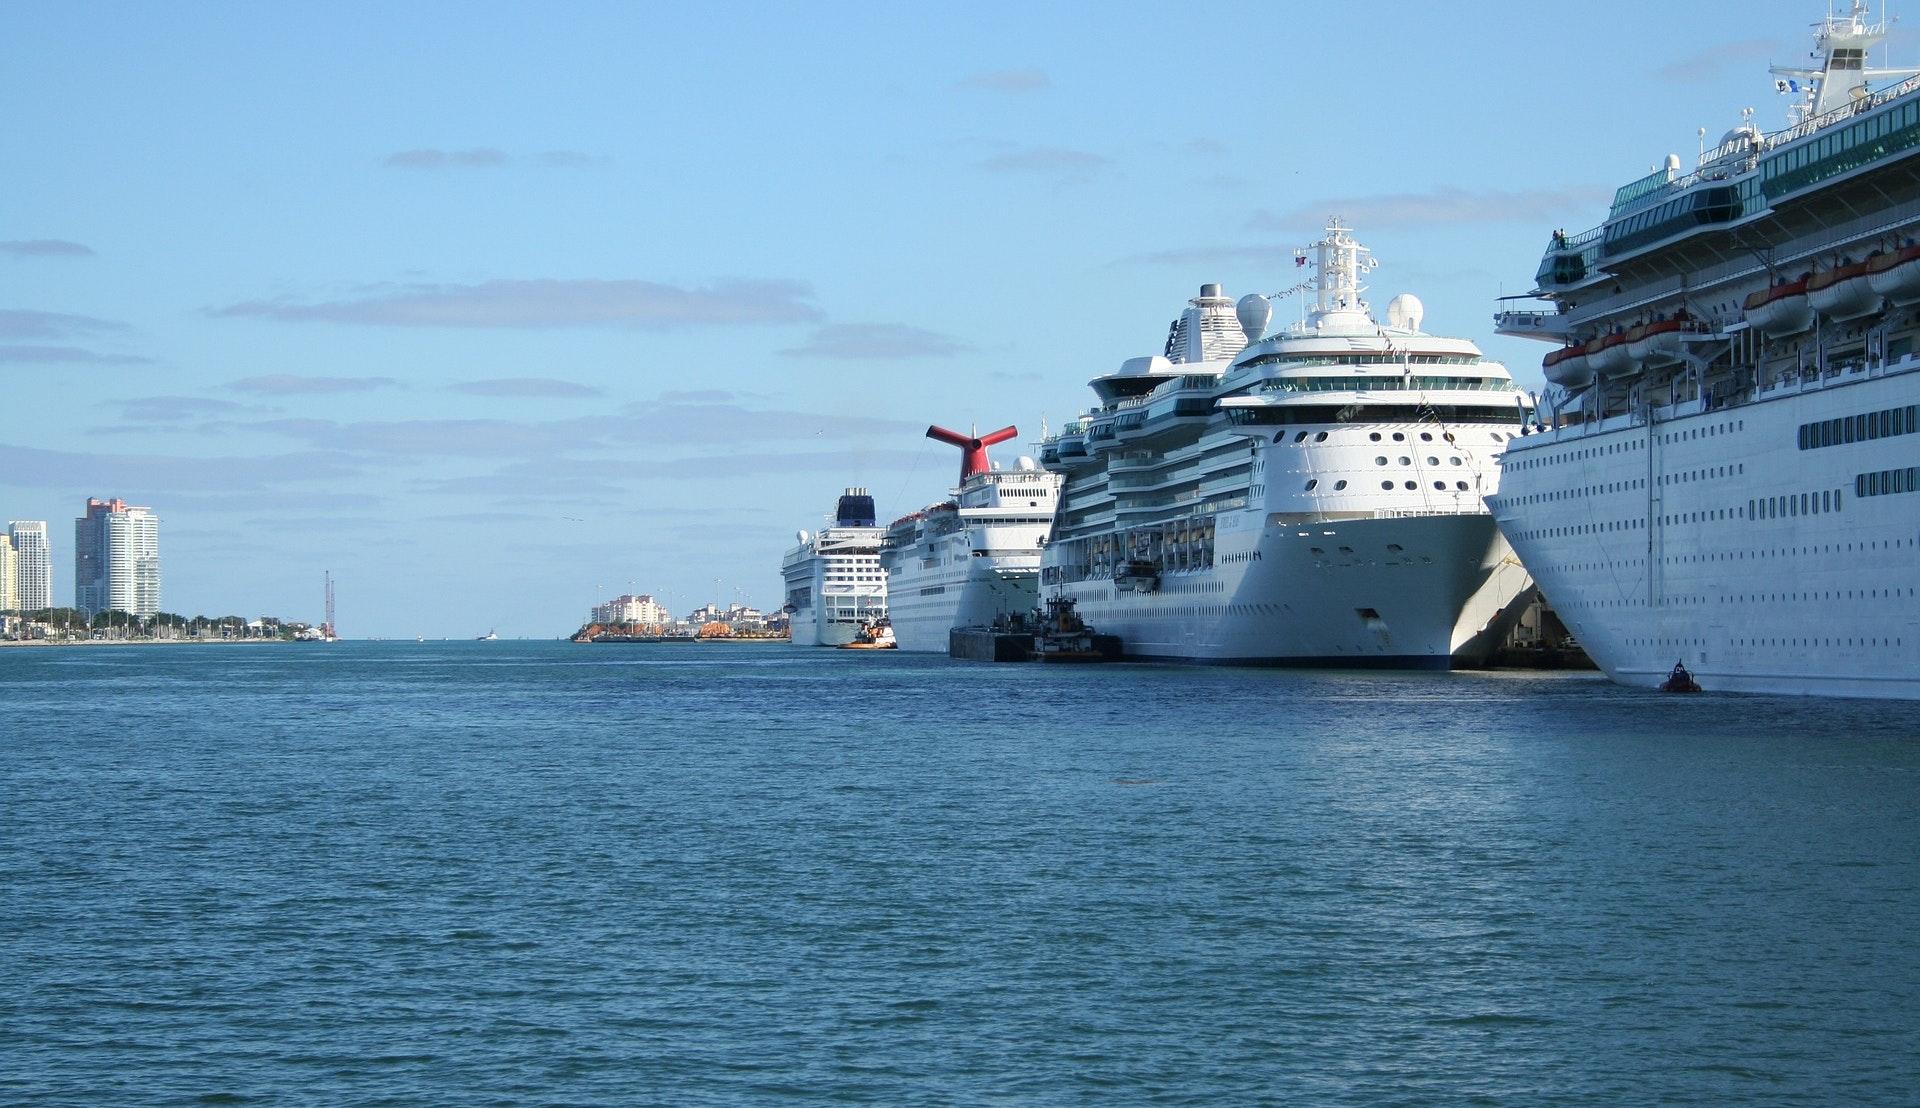 Cruisehavnen i Miami © zopalic, Pixabay